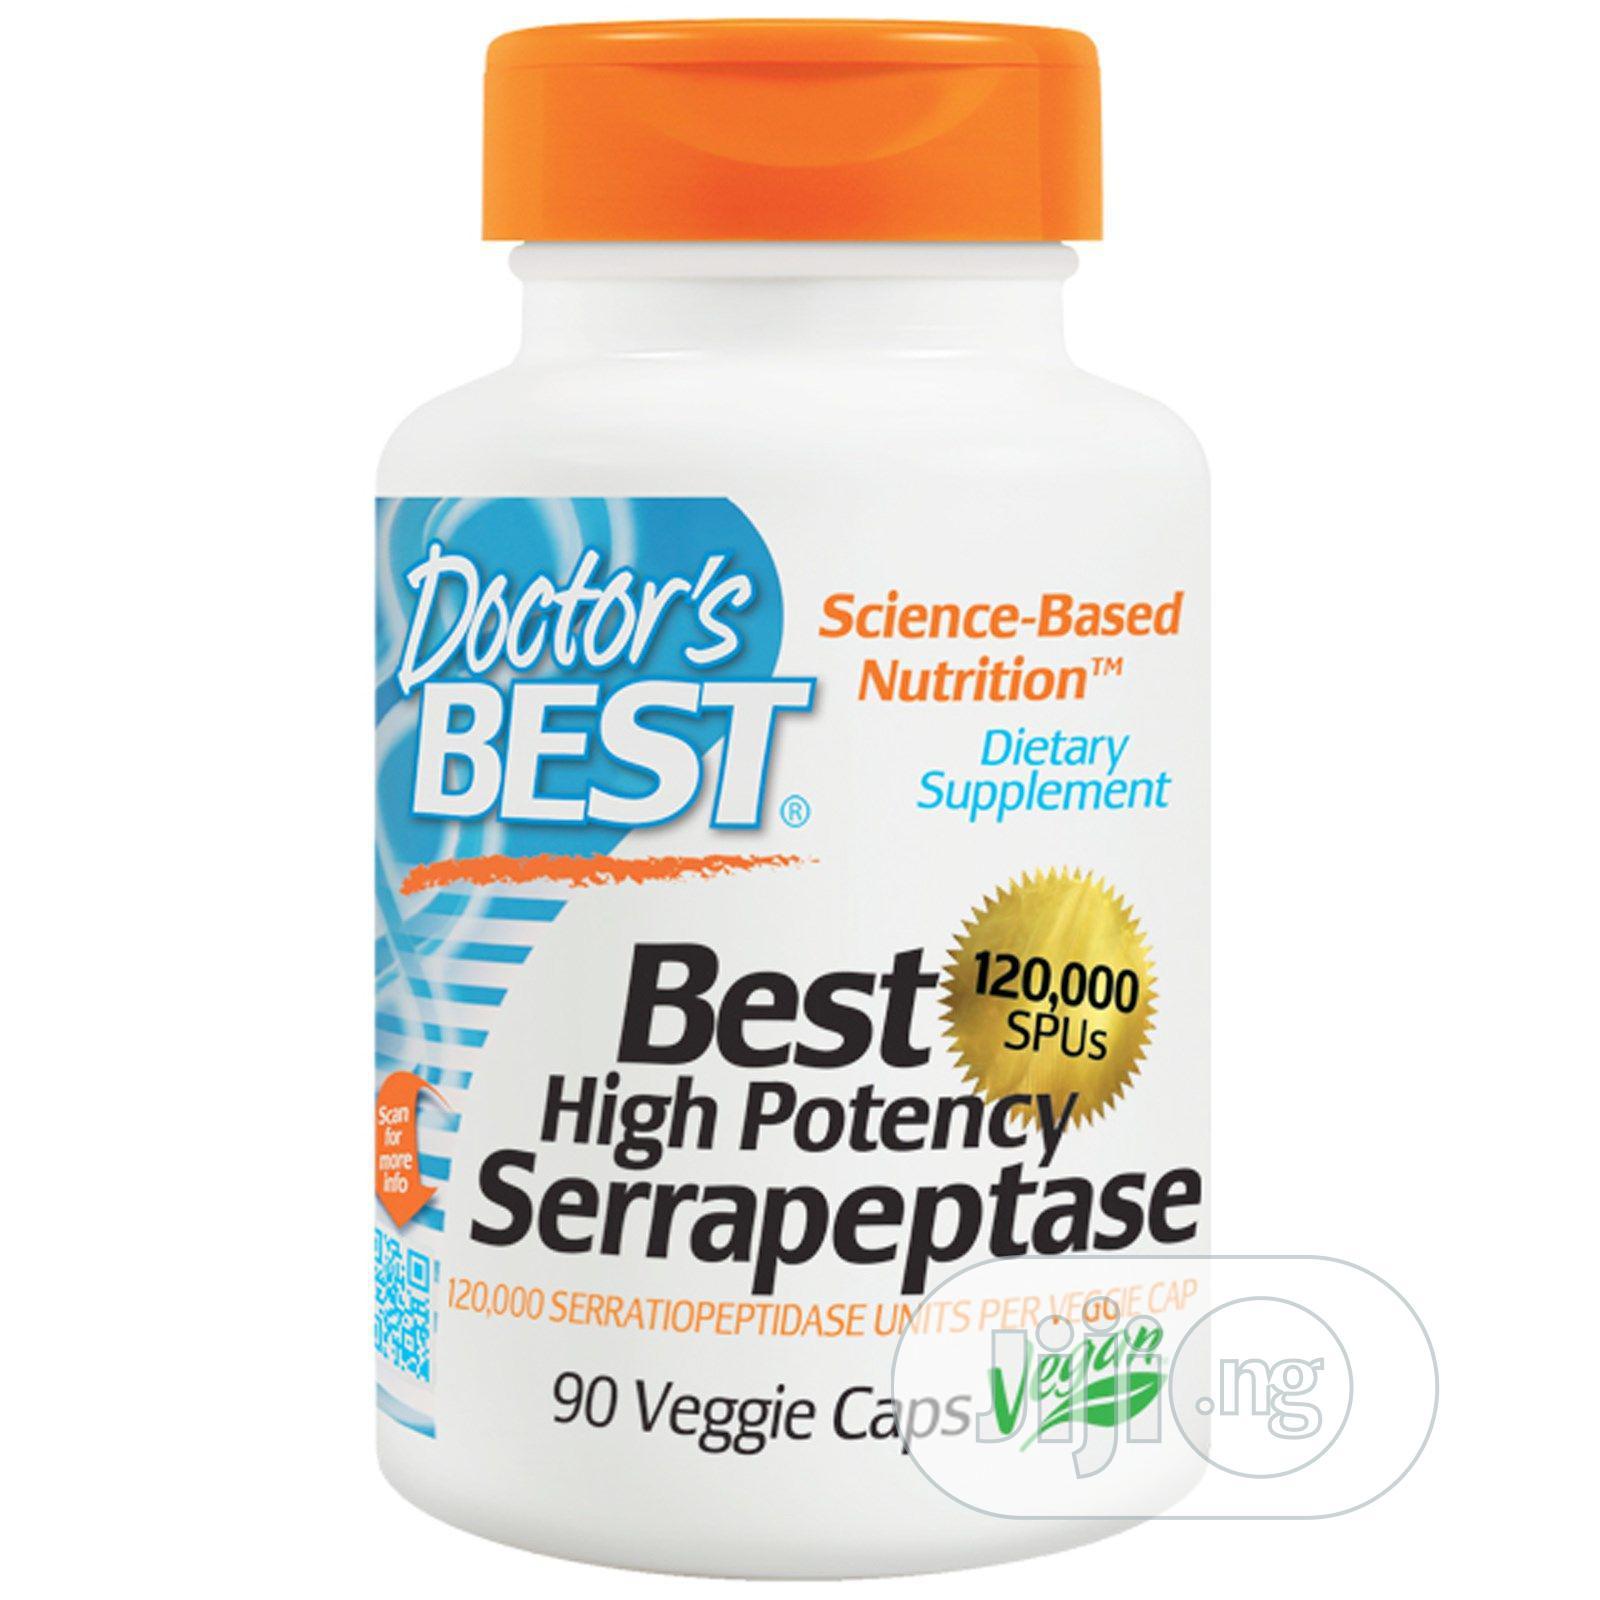 Archive: 1 Doctor's Best High Potency Serapeptase 120000spu